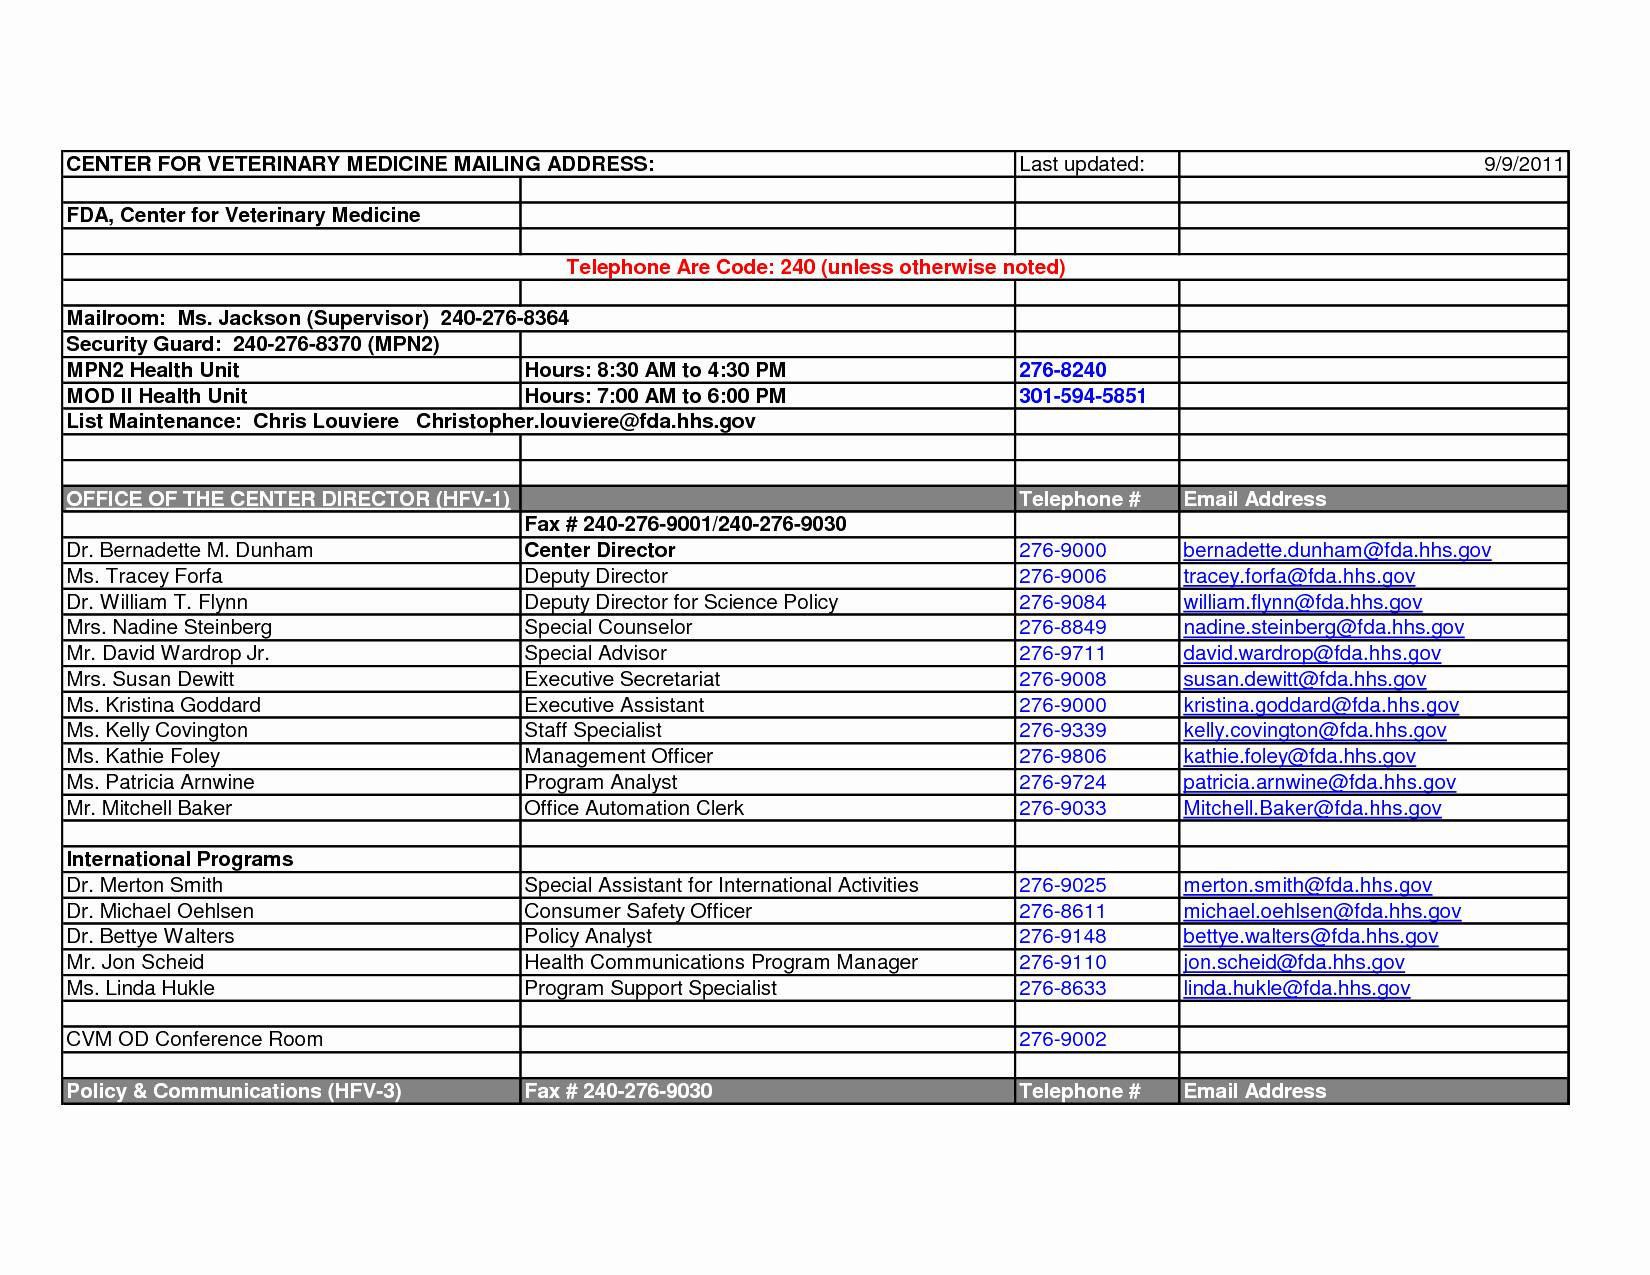 Spreadsheet Software Free Windows 10 Regarding 36 Inspirational Free Spreadsheet Software For Windows Vista